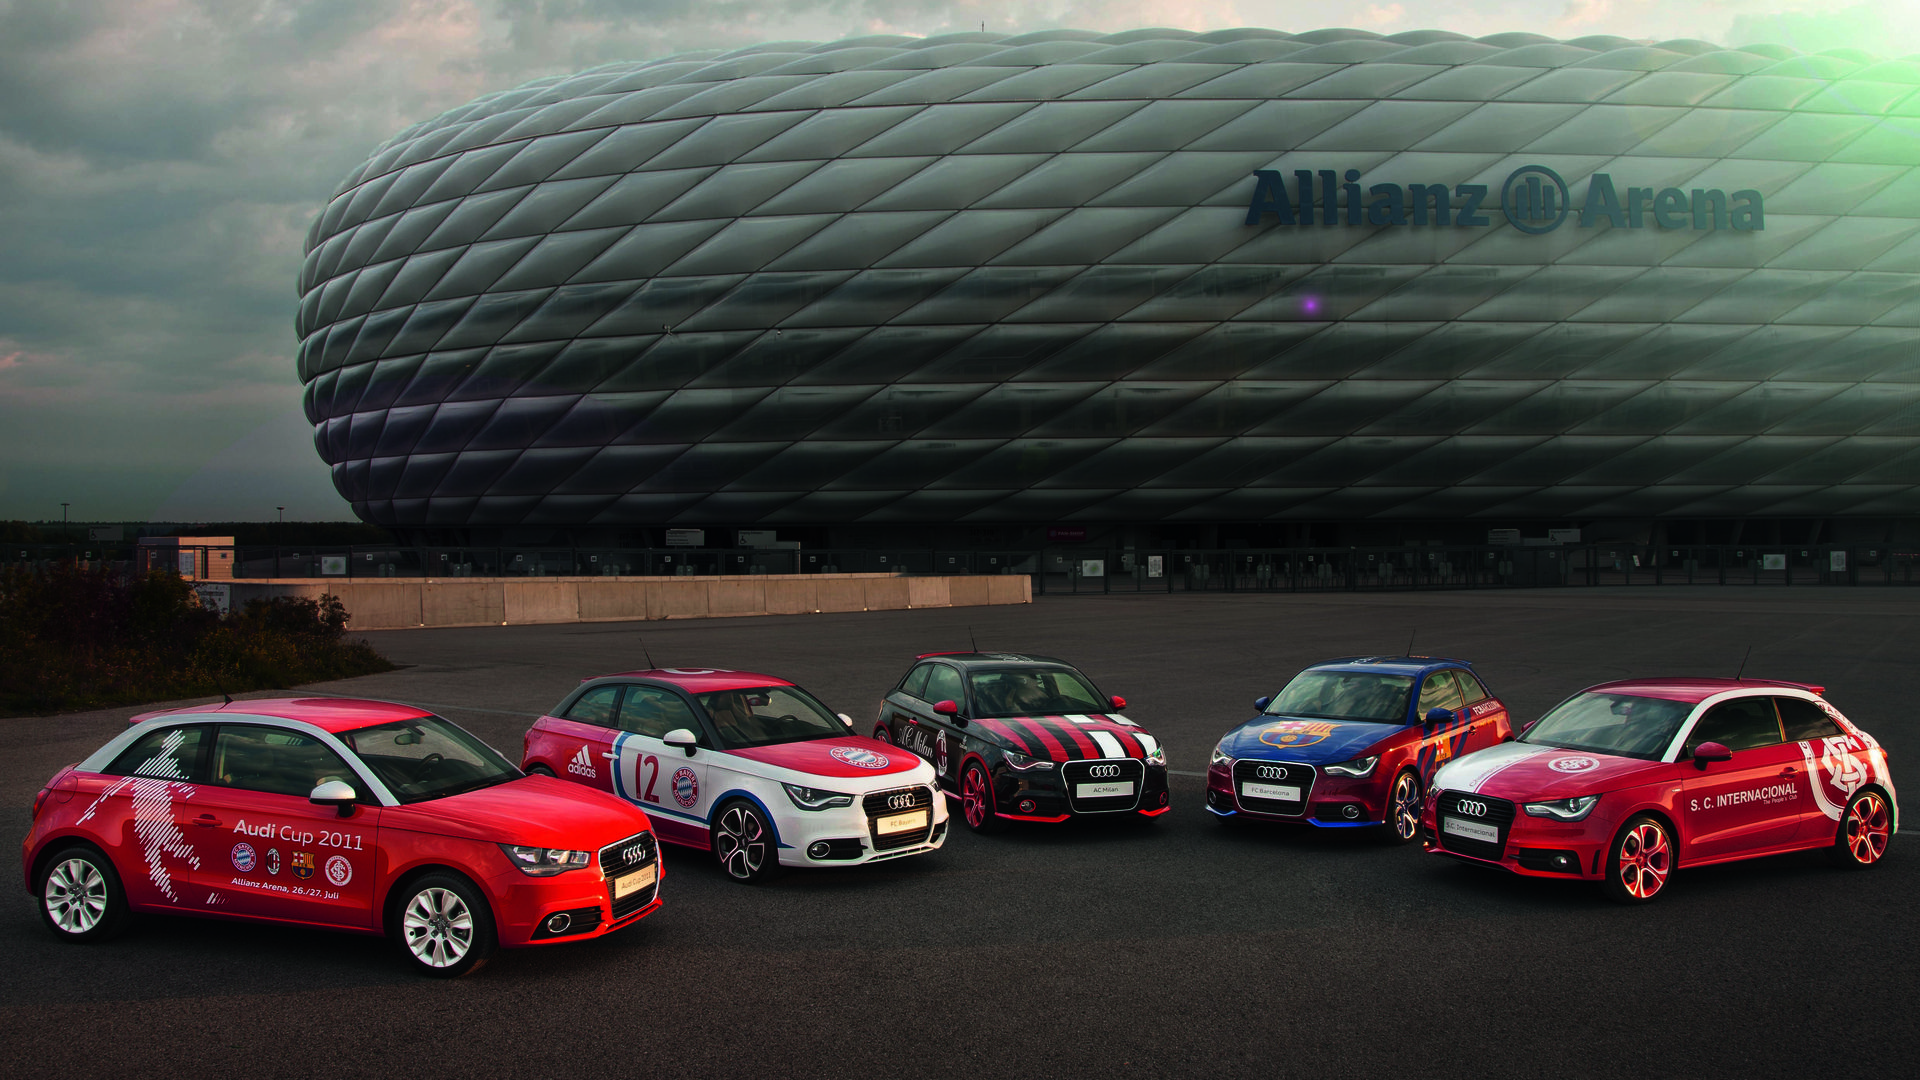 Audi Sports Car Lot Wallpaper Httpwwwgbwallpaperscomaudi - Audi car lot